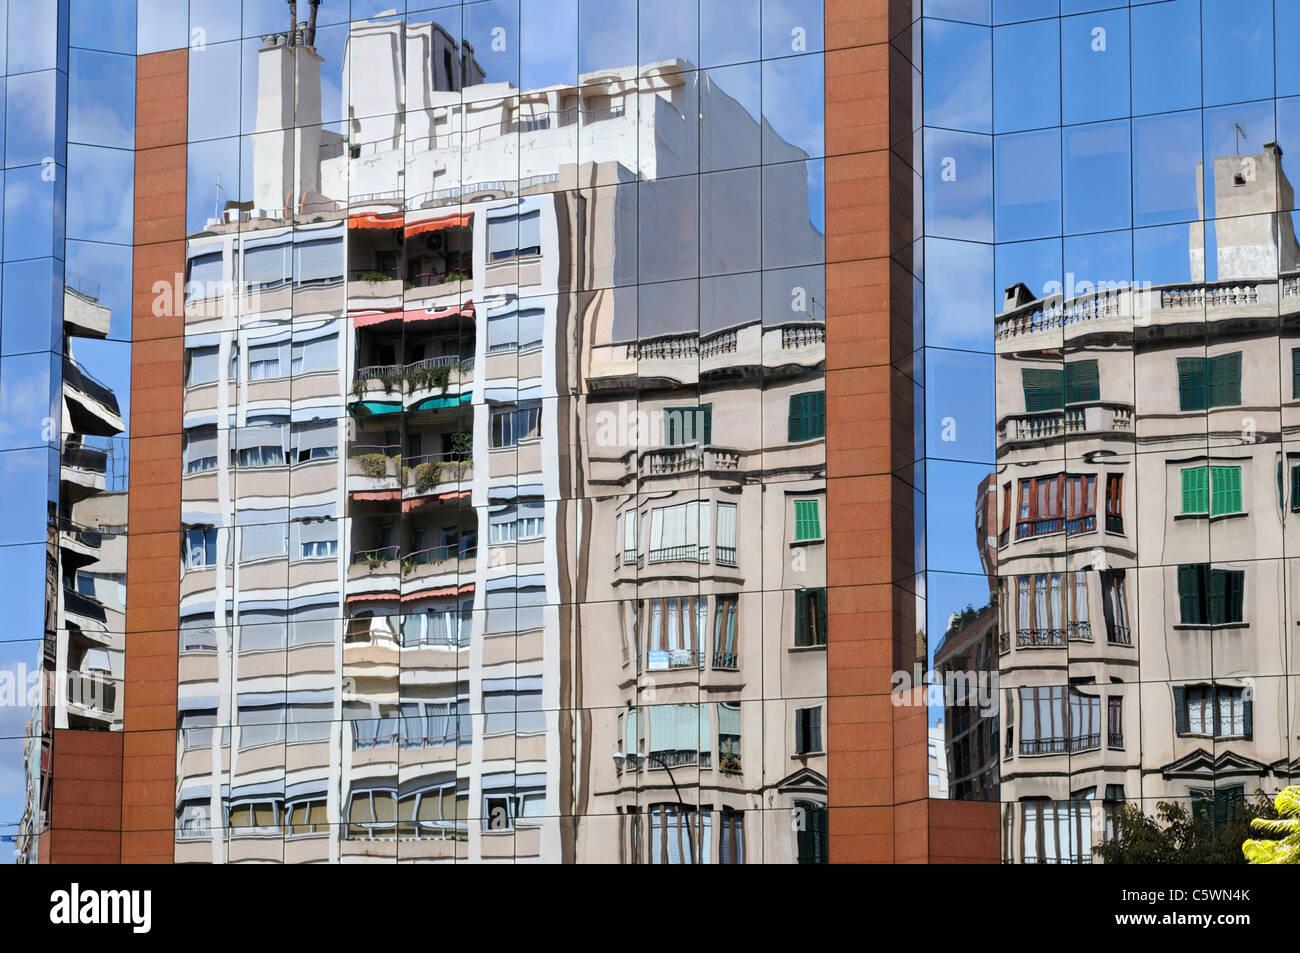 Aluminium-Glas-Fassade eines Bürogebäudes, Palma, Mallorca. - Aluminium glass facade of an office building, Palma, Stock Photo